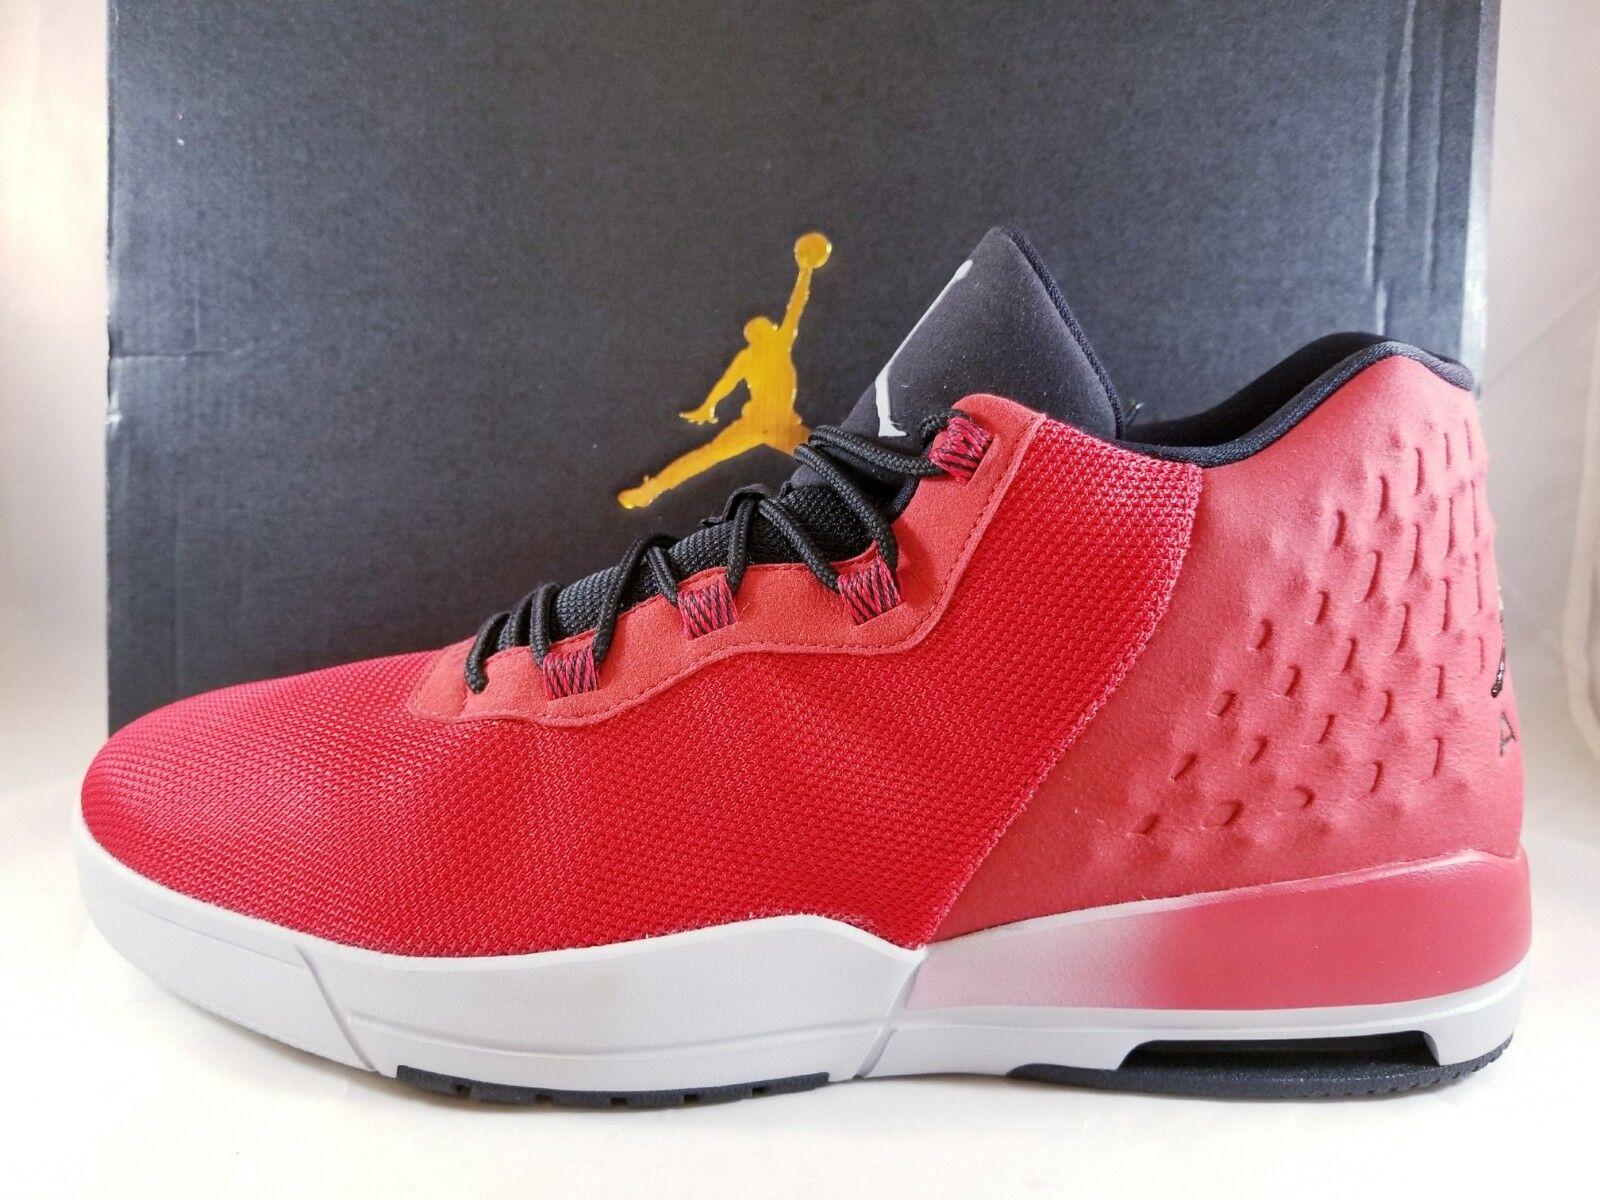 Nike Shoe Jordan Academy Men's Basketball Shoe Nike 844515 600 Size 12 de784d